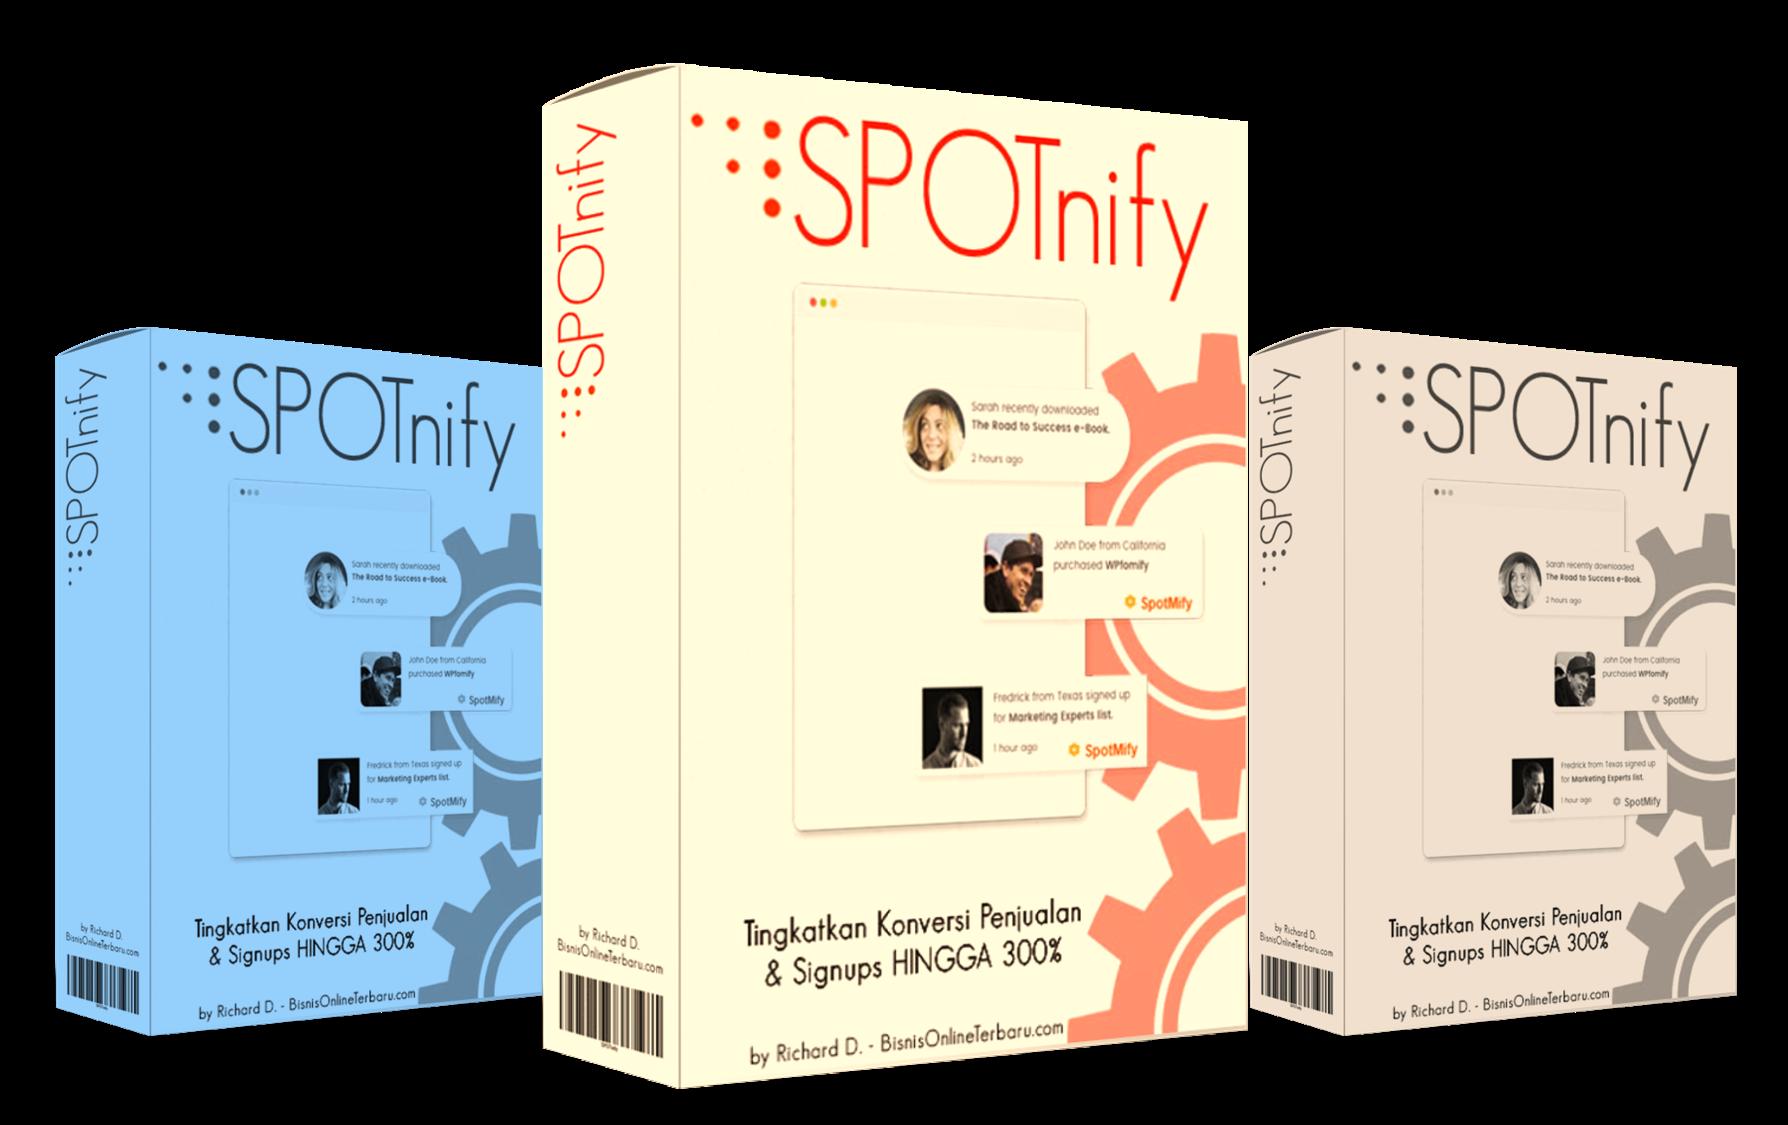 SPOTnify bikin penjualan meningkat 10 kali lipat